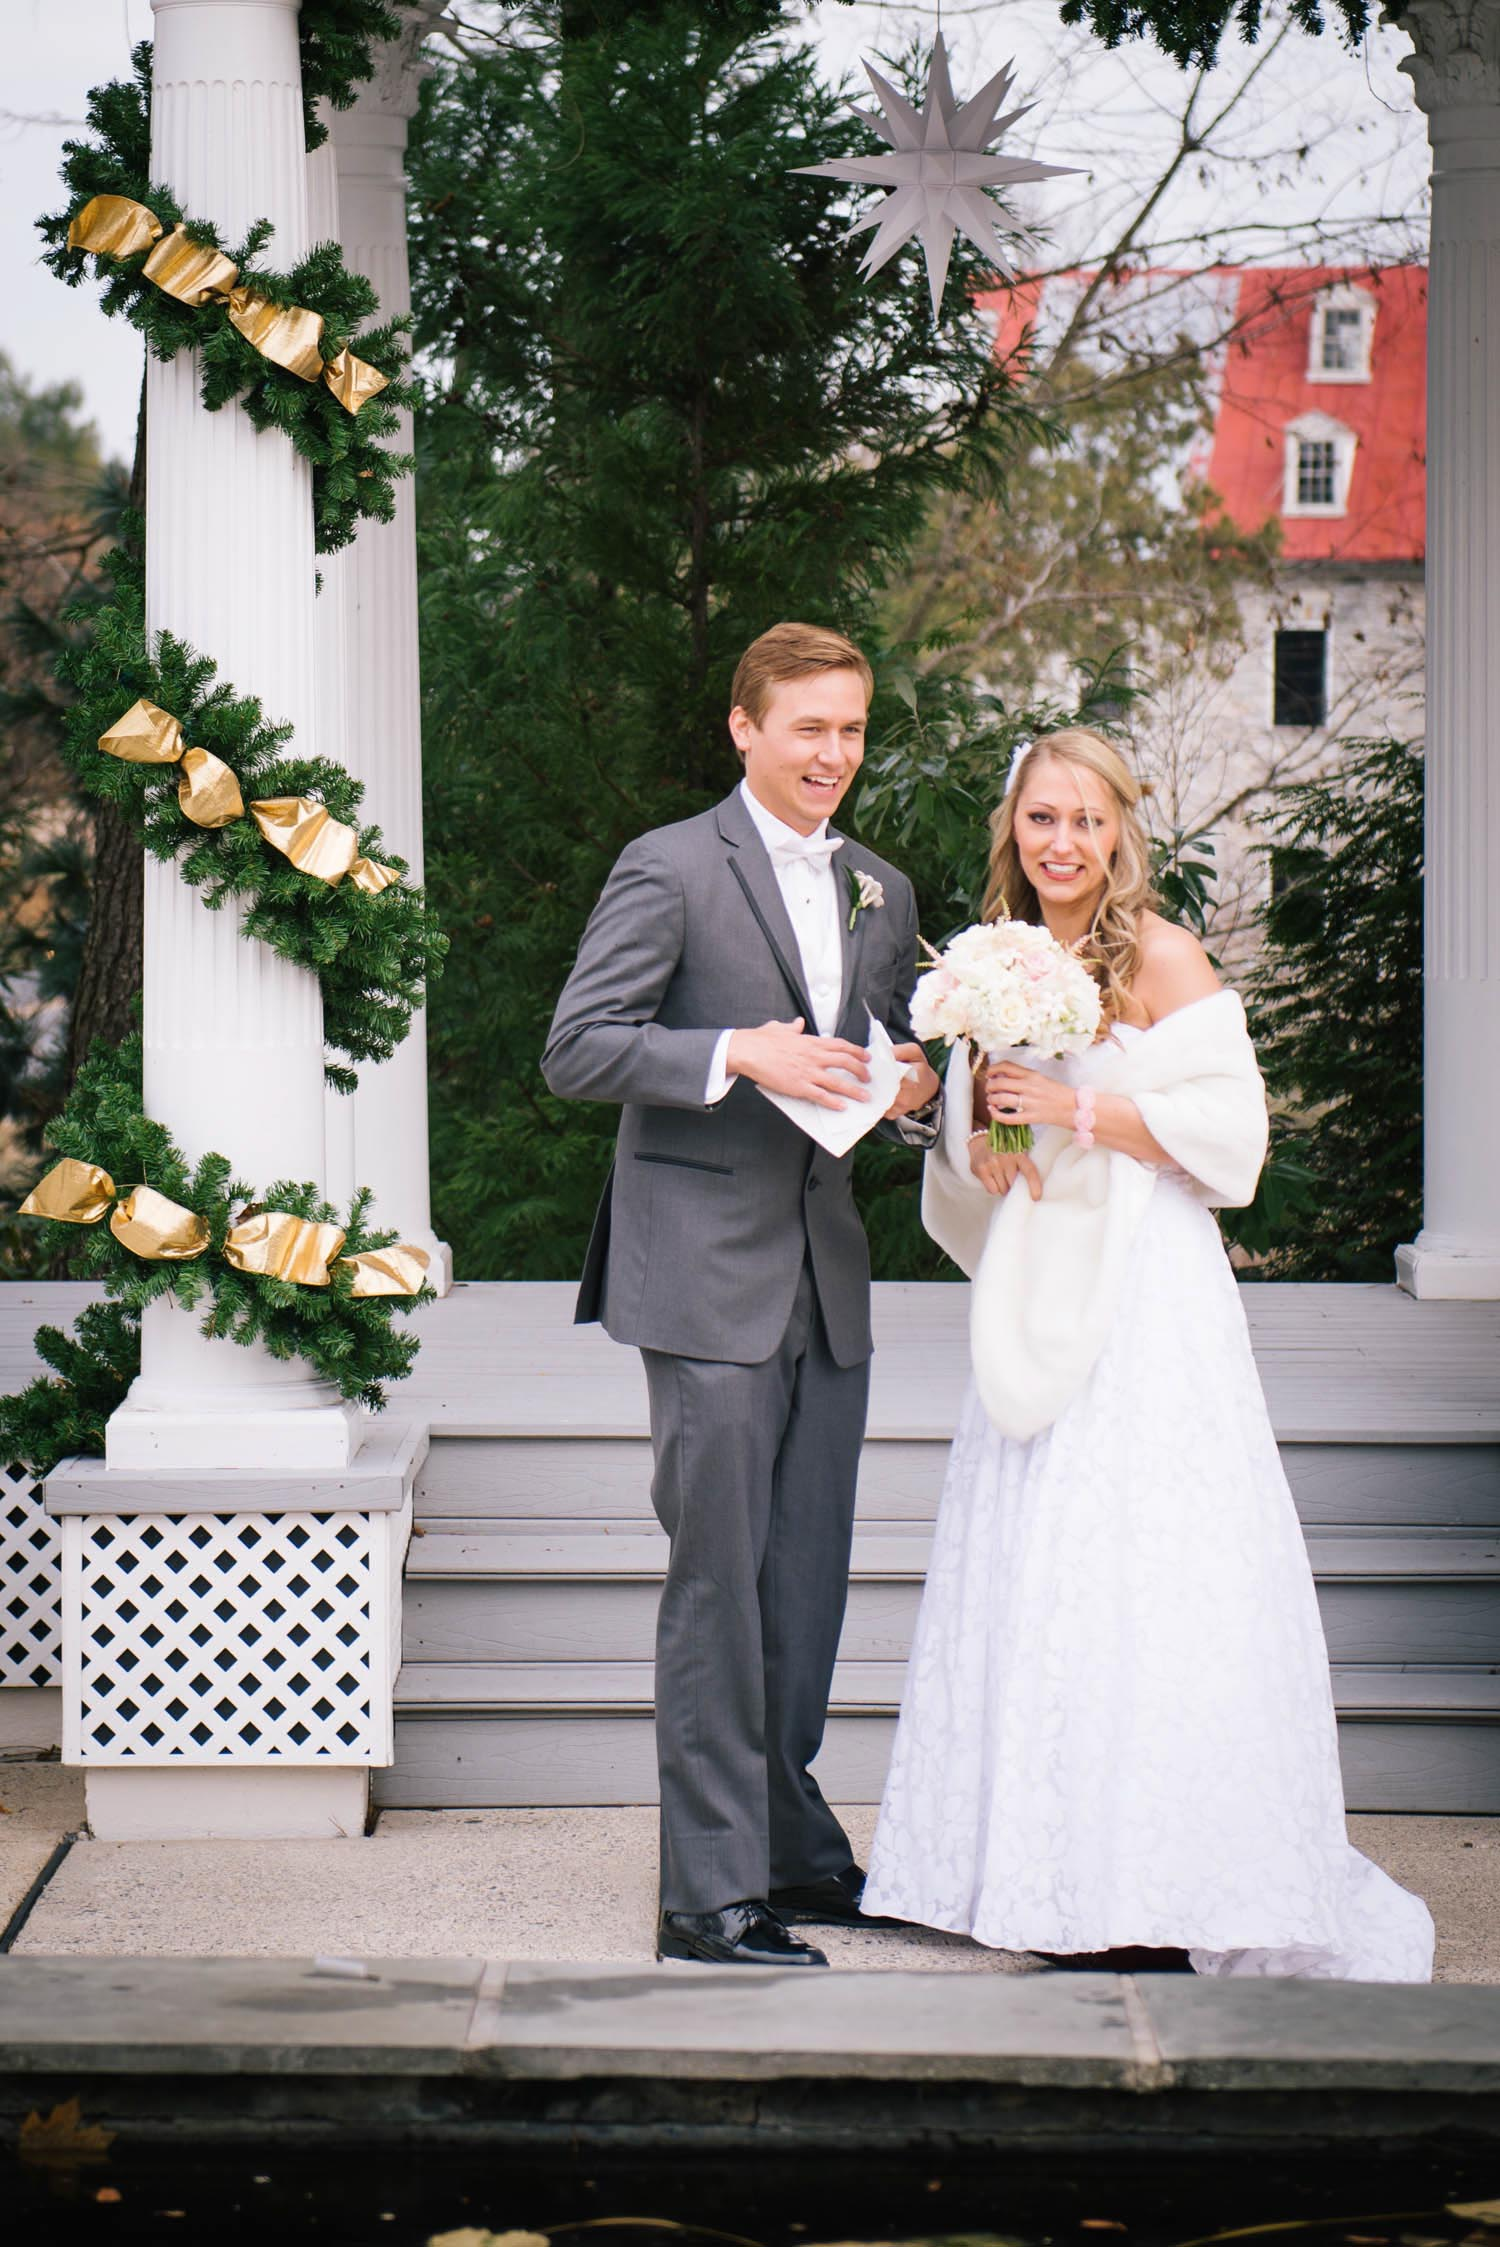 youngstrom-wedding-71.jpg